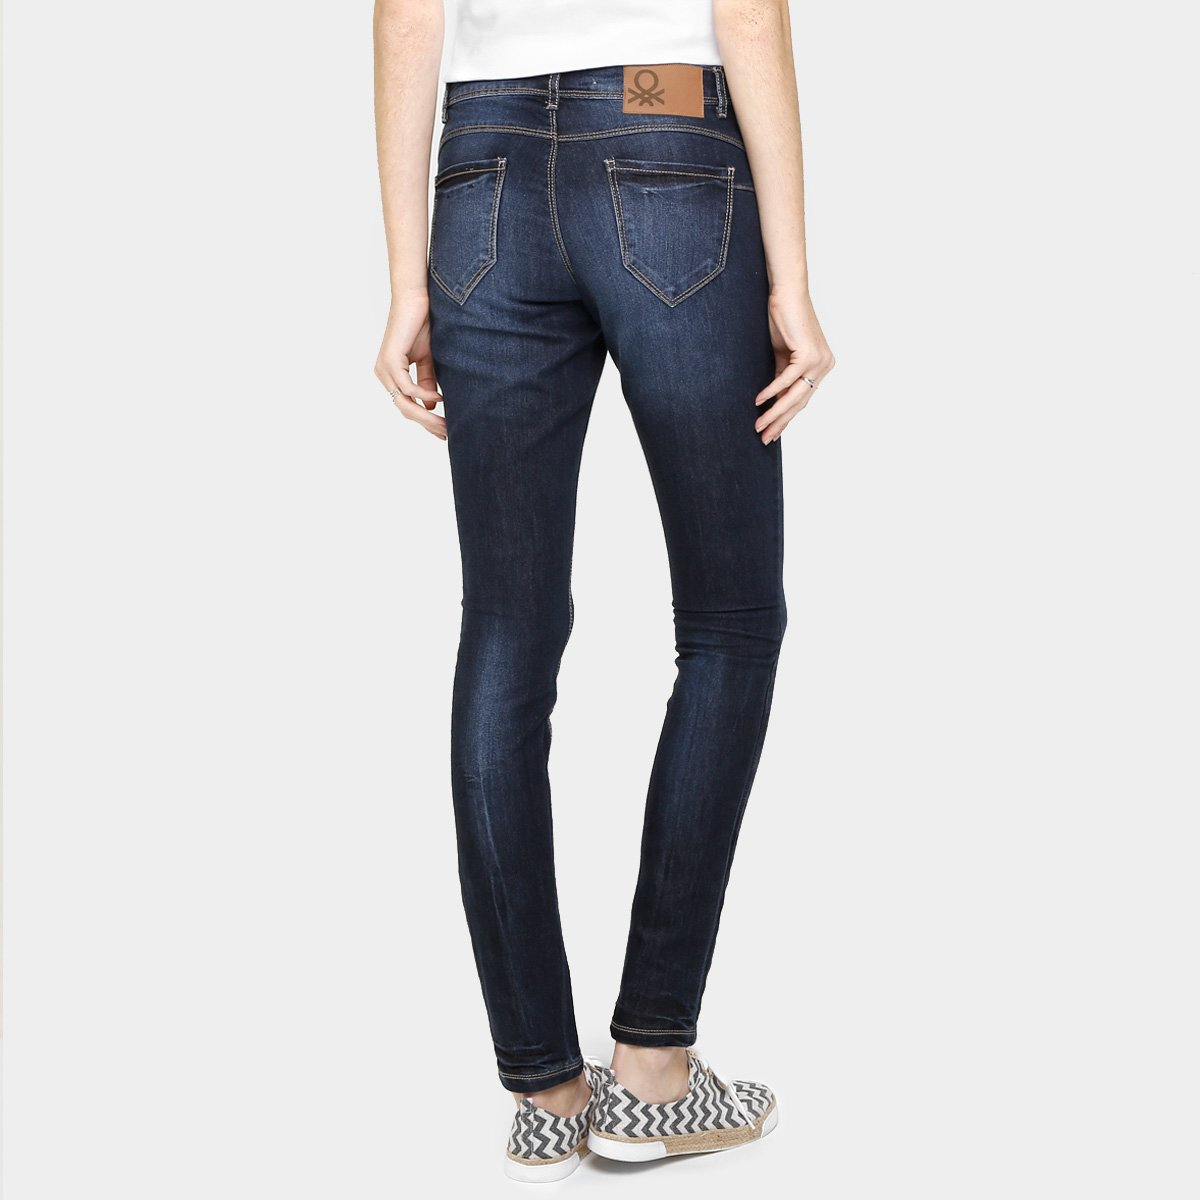 716049aa98 Calça Jeans Benetton Skinny Estonada  Calça Jeans Benetton Skinny Estonada  ...